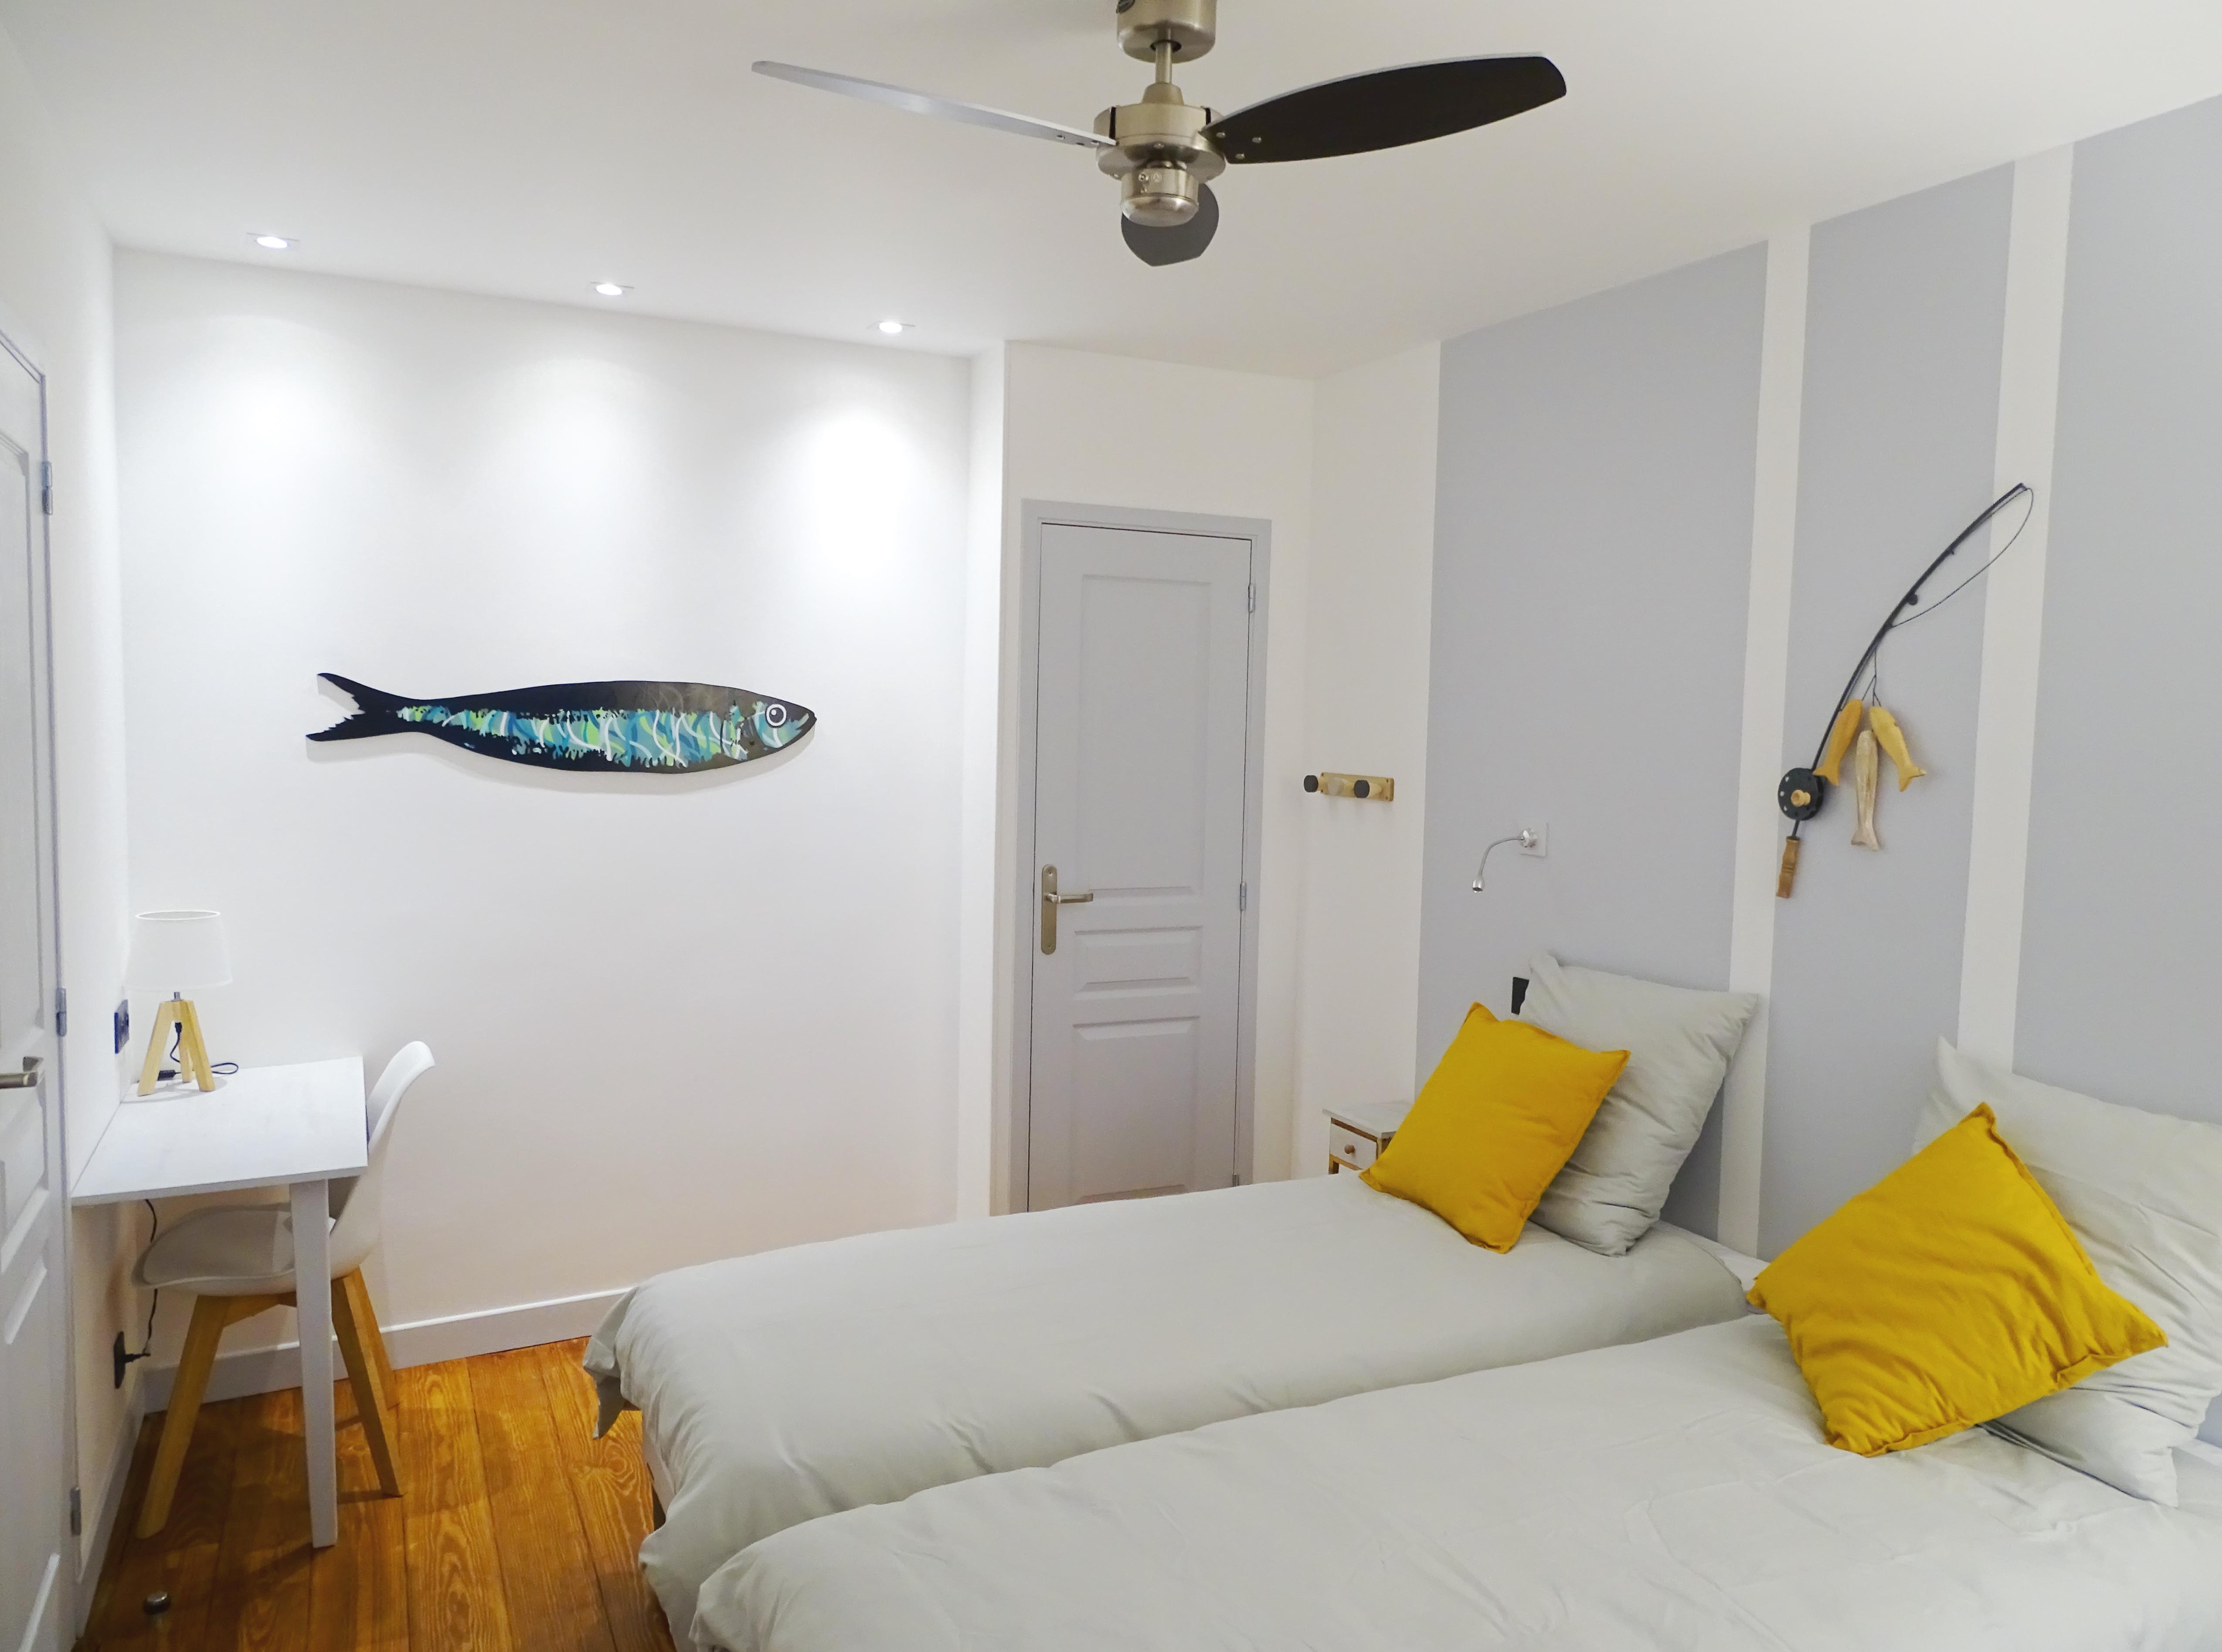 22-chambre barracuda 2